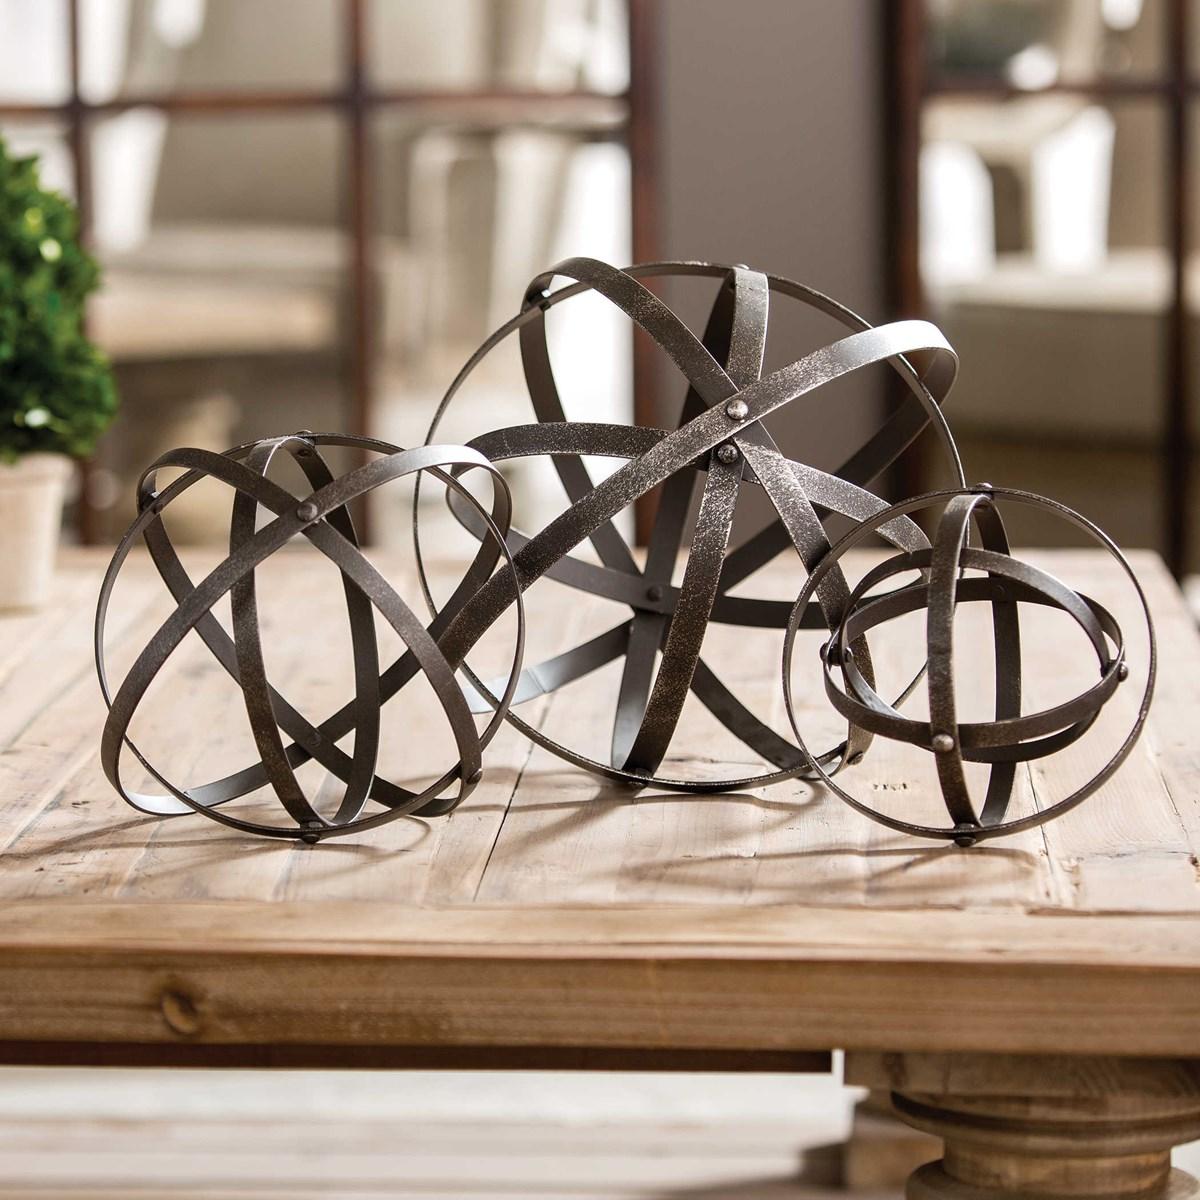 Stetson Decor Spheres, Set of 3